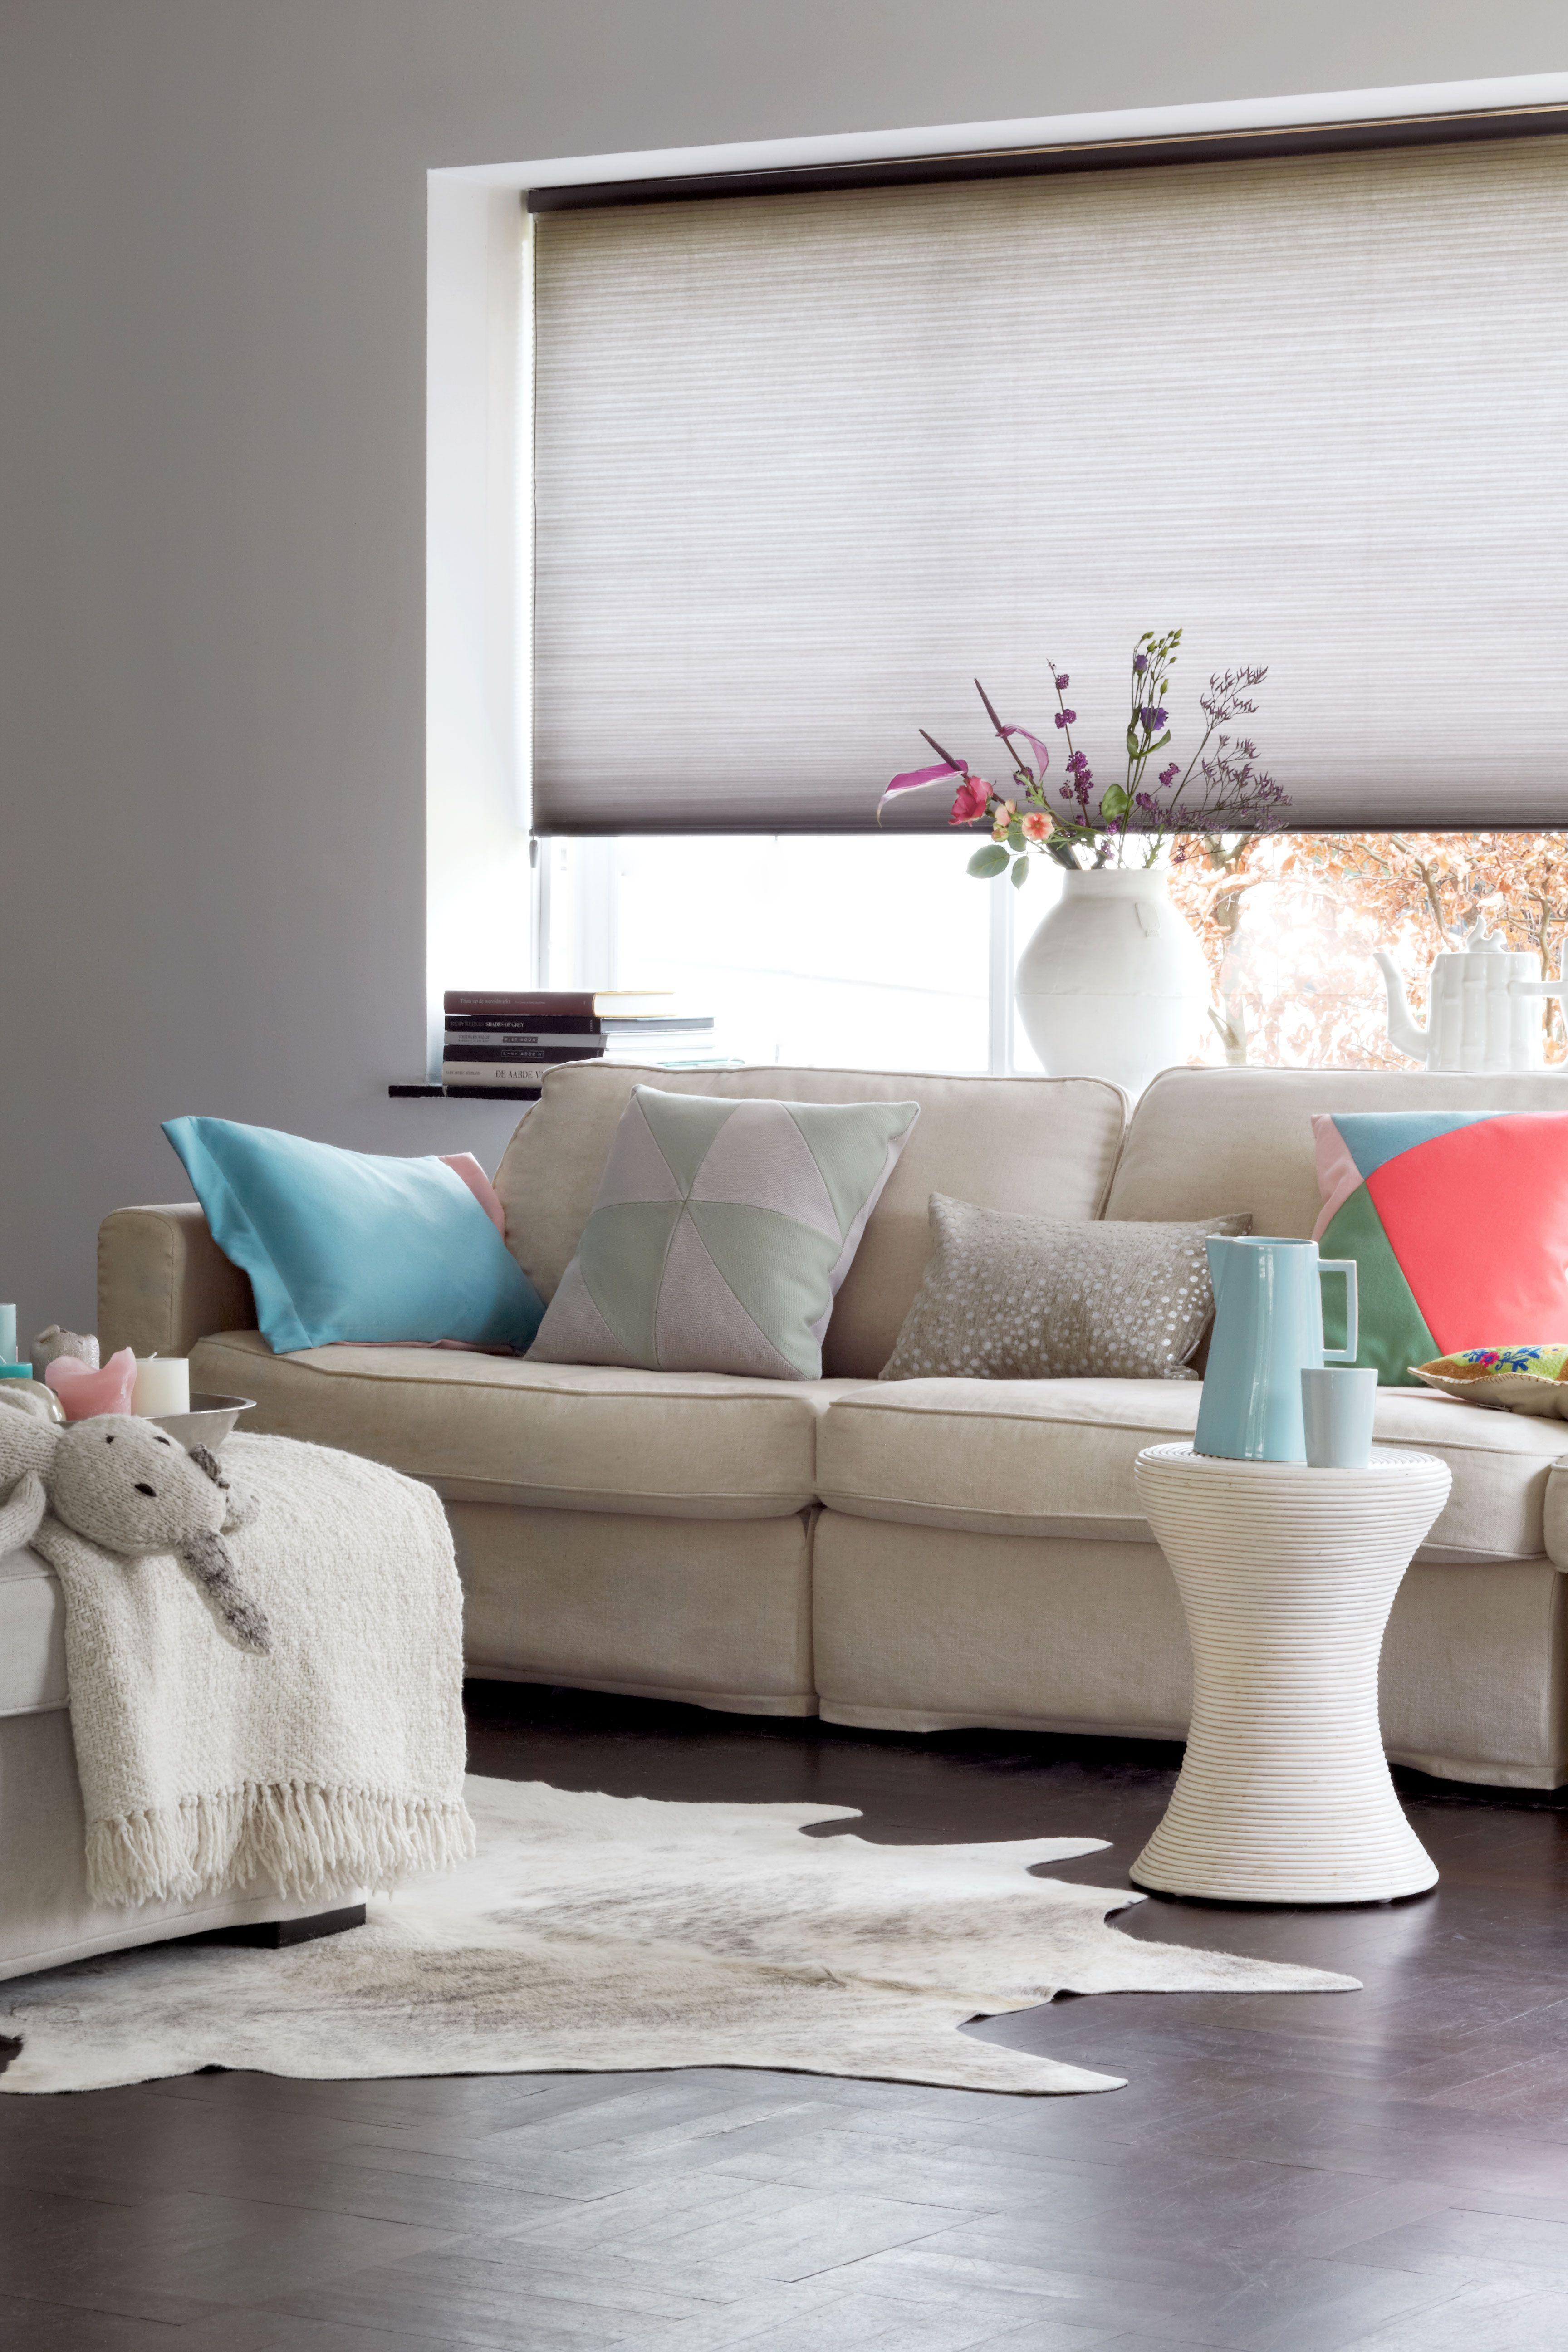 Pin by timmermans indoor design on plissé u duette pinterest window